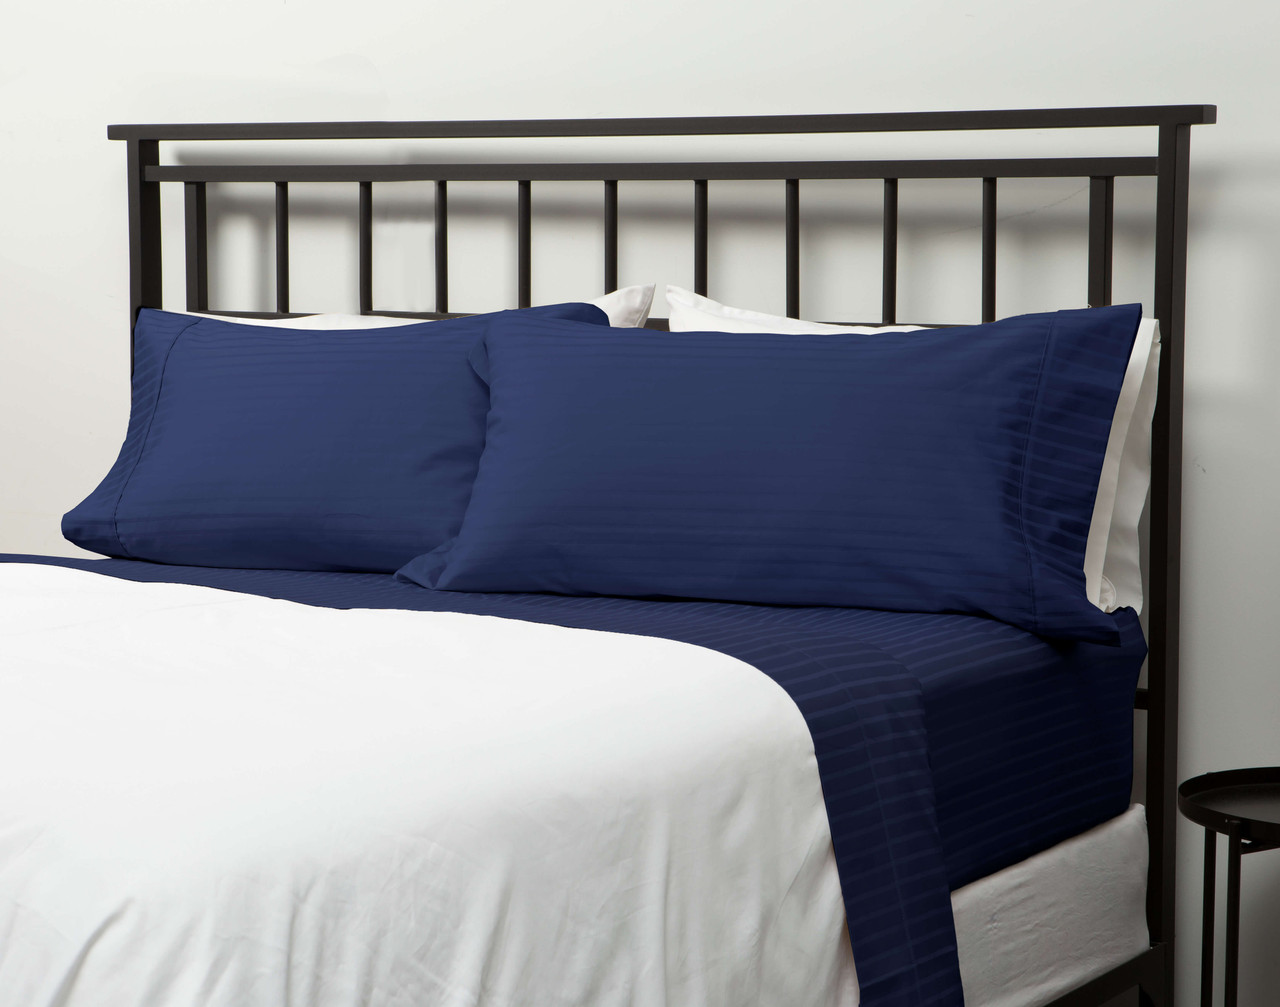 450TC Wrinkle Resistant Egyptian Cotton California King Sheet Set in Navy Blue